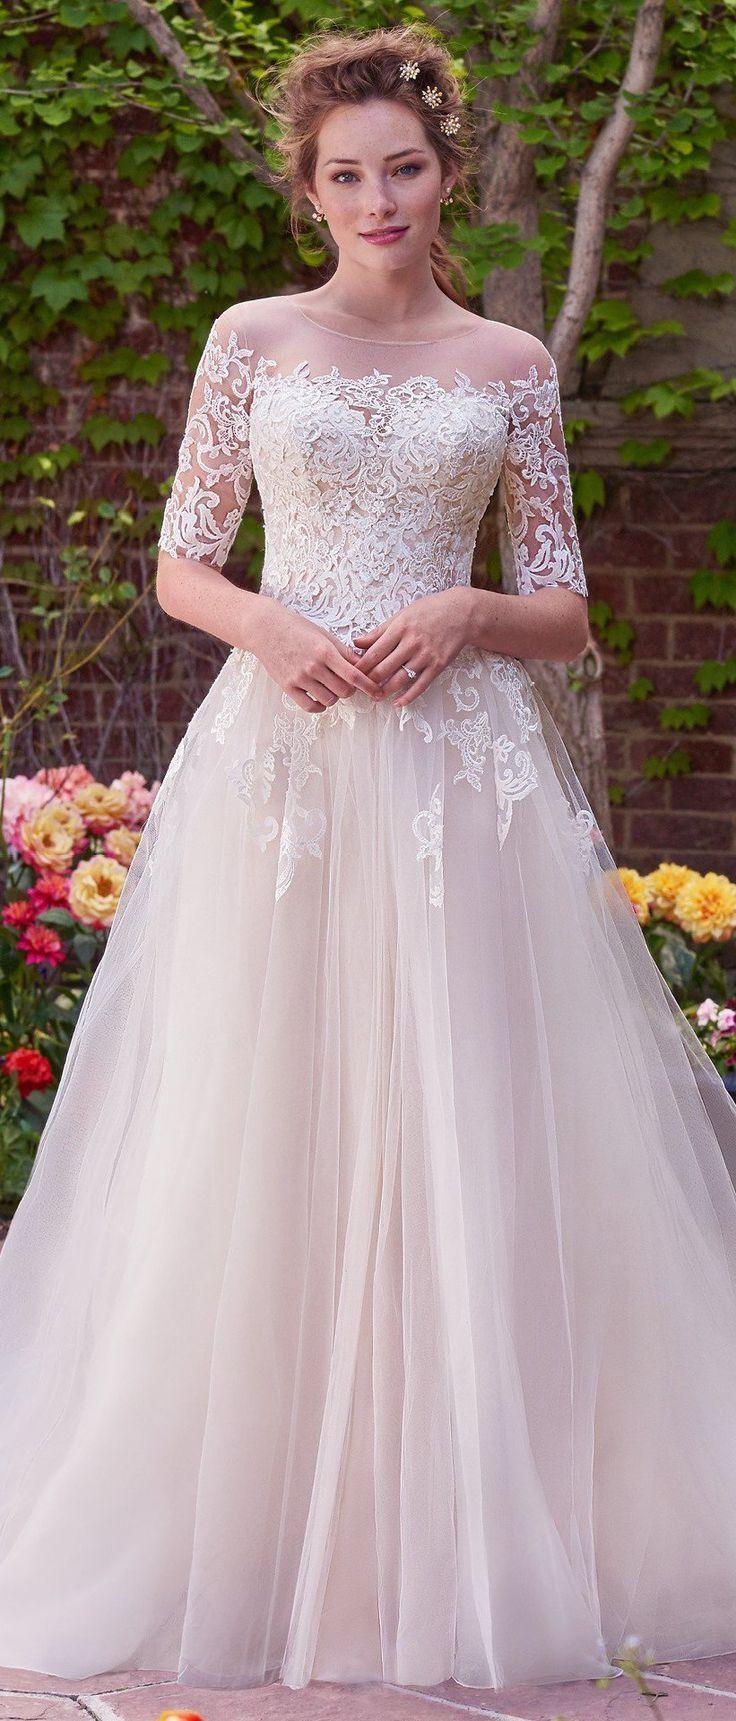 Wedding Dresses Paradise - Wedding Dress by Rebecca Ingram - Yvonne ...